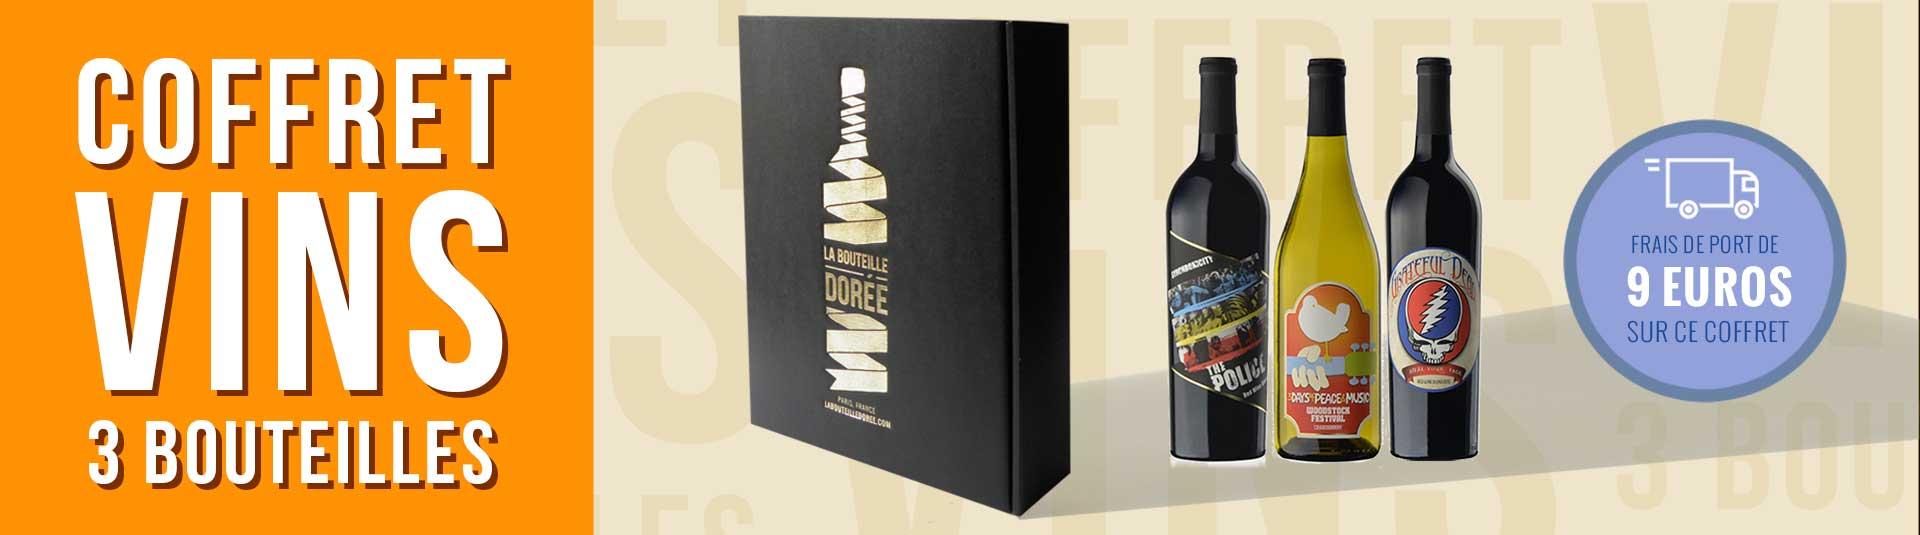 Coffret vin Rock USA 3 bouteilles